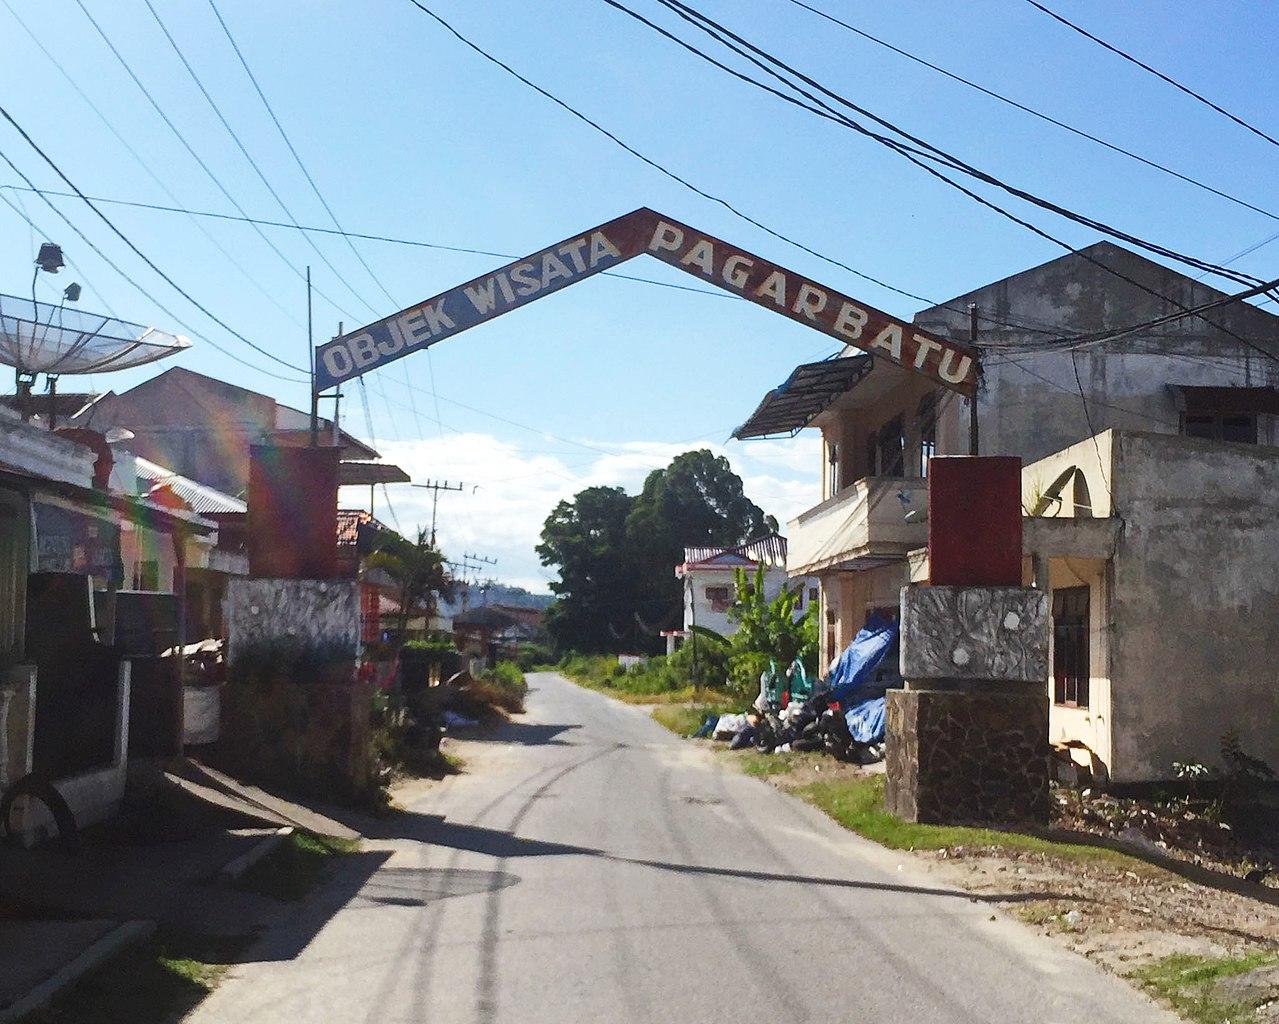 Berkas:Welcome gate to Silalahi Pagar Batu (Pagar Batu ...